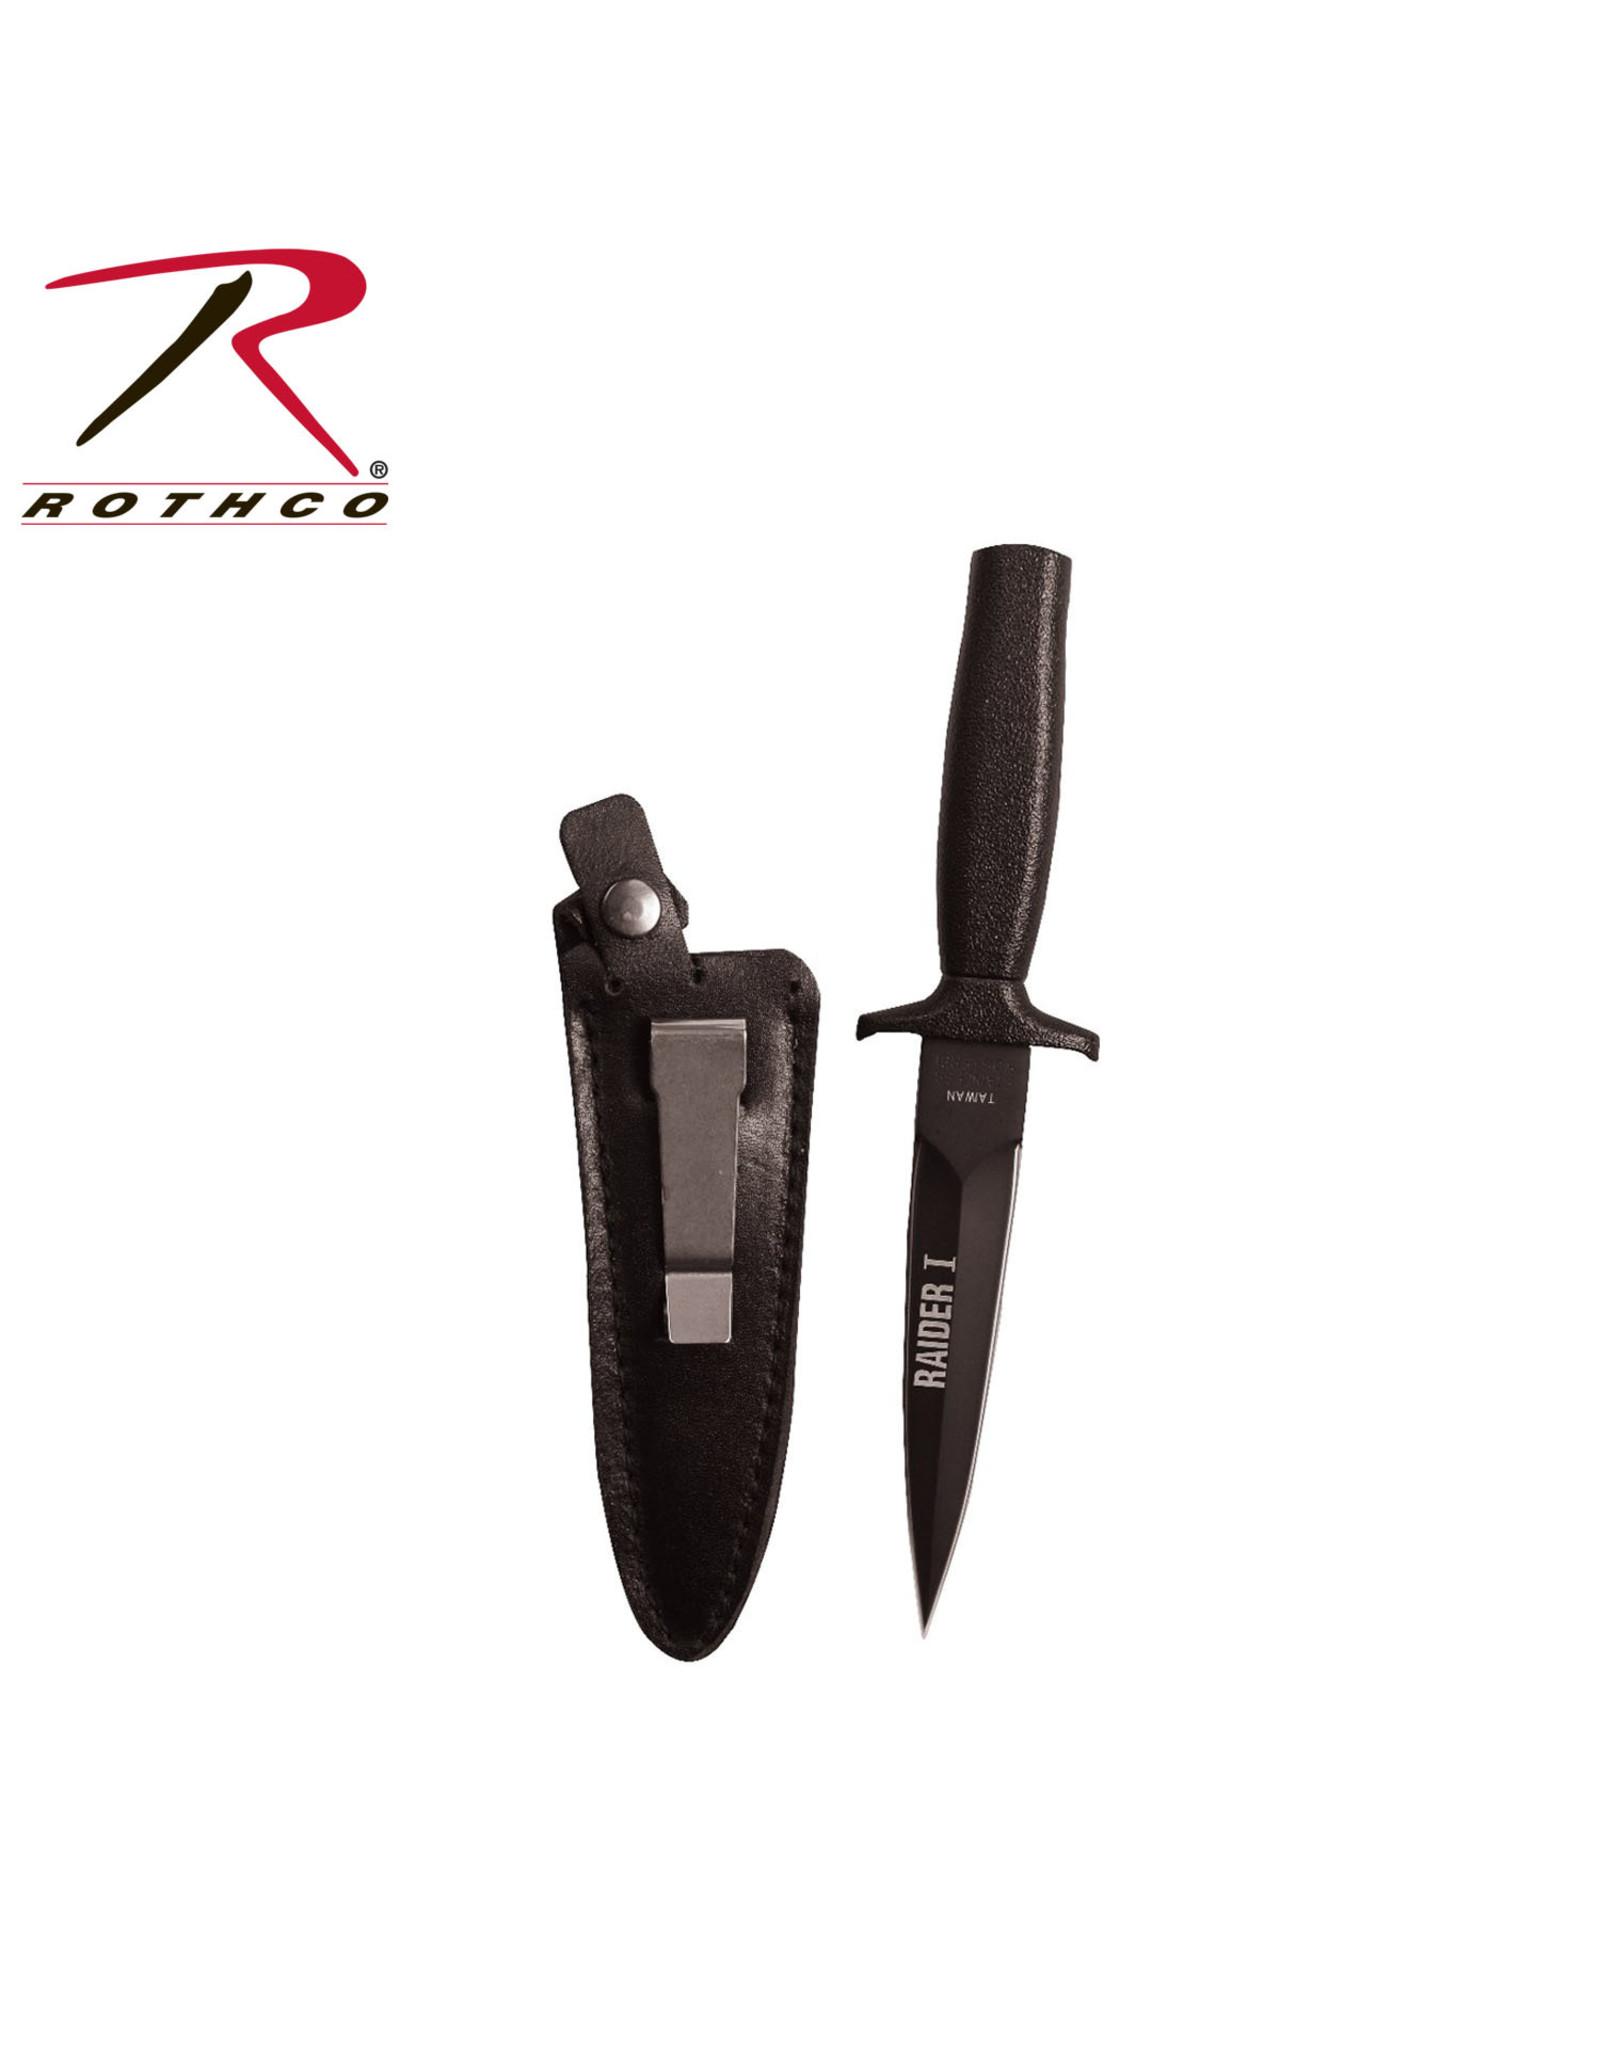 Rothco Black Matte Raider I Boot Knife